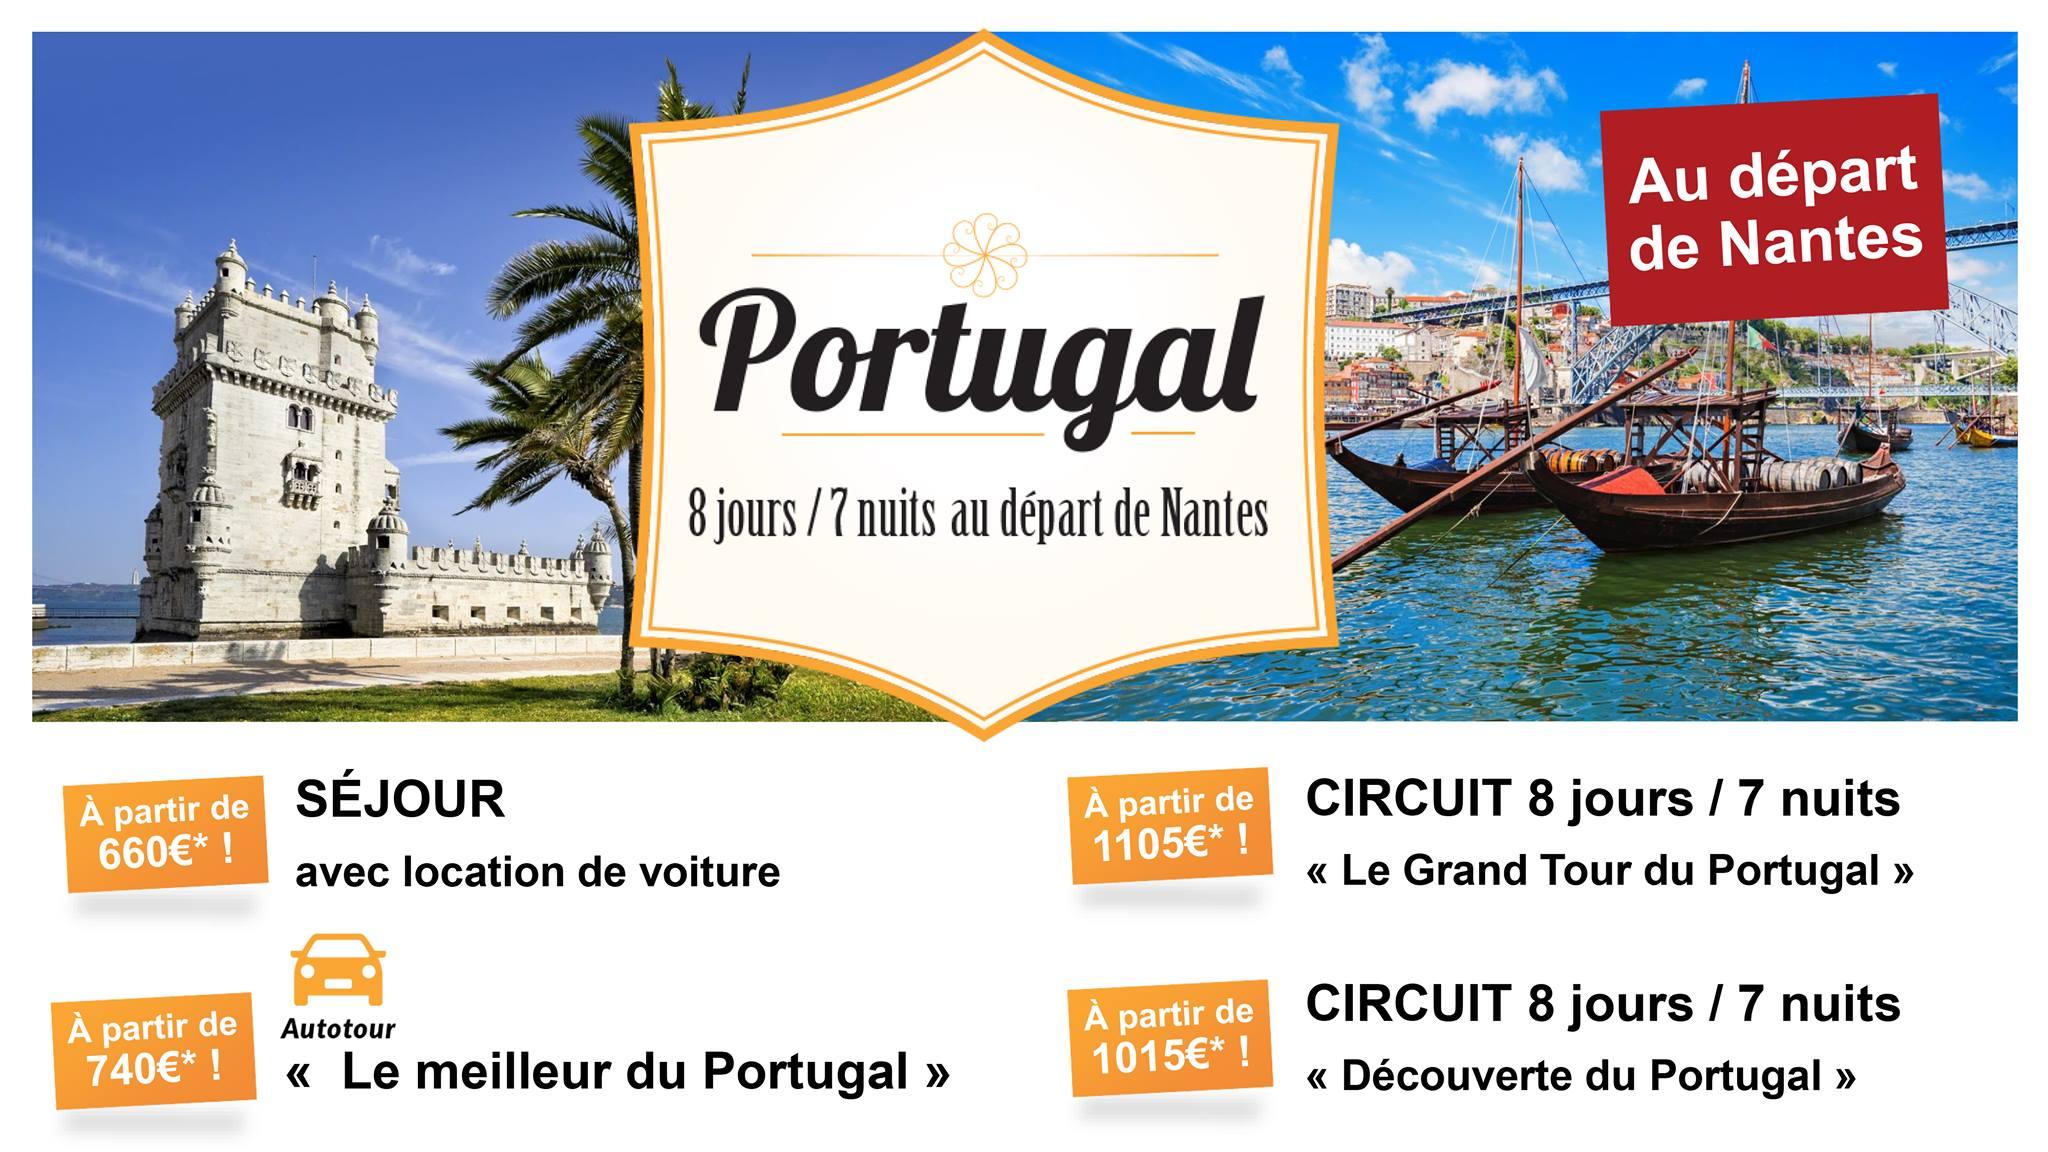 http://www.v-i.travel/pro/flyers/Vi_flyer_A4RV_portugal_201802.pdf